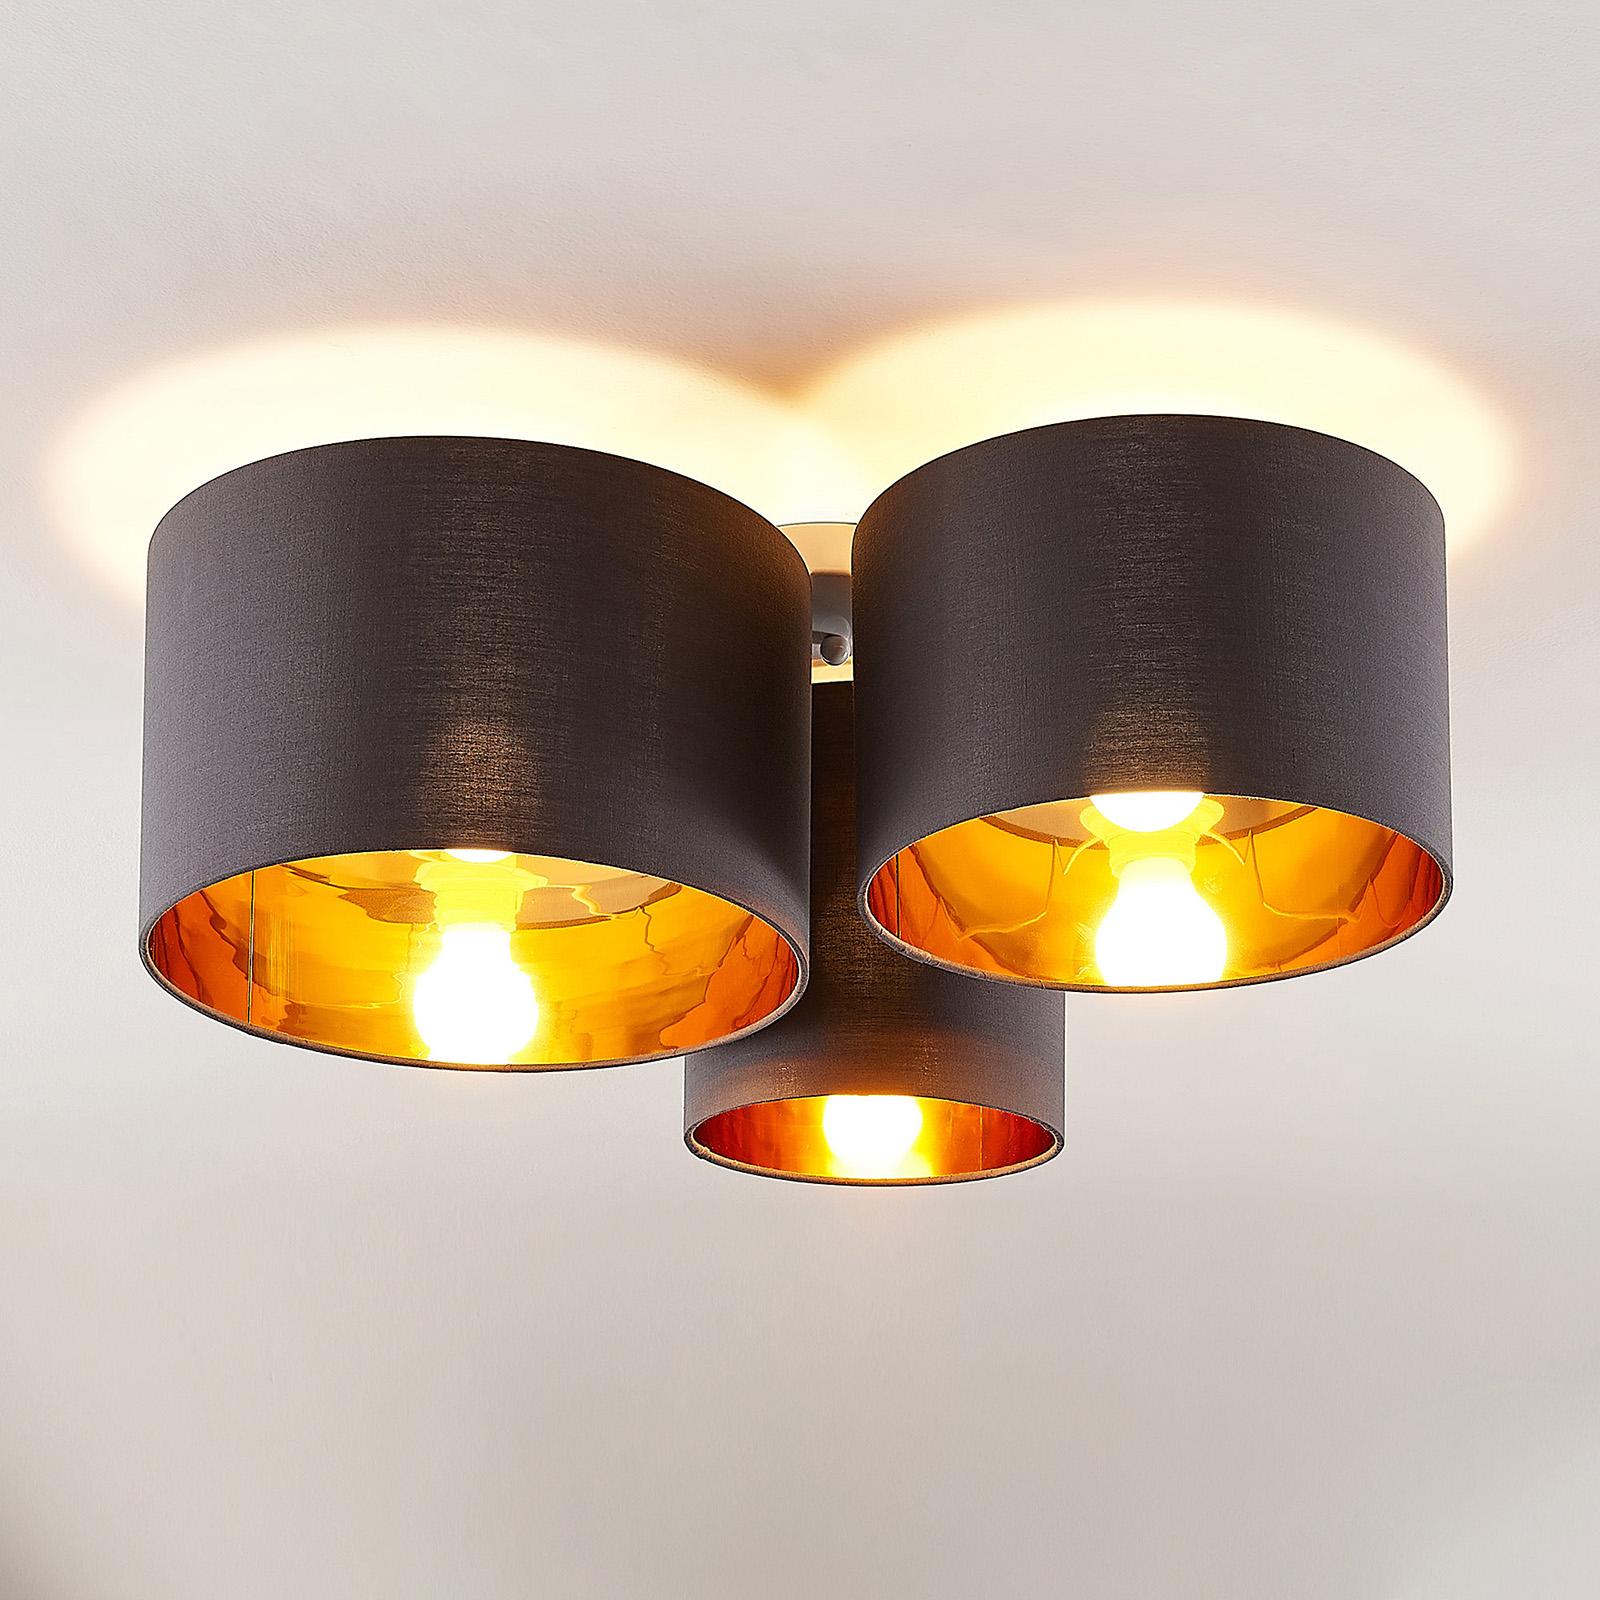 Lindby Laurenz taklampe, 3 lyskilder, grå-gull